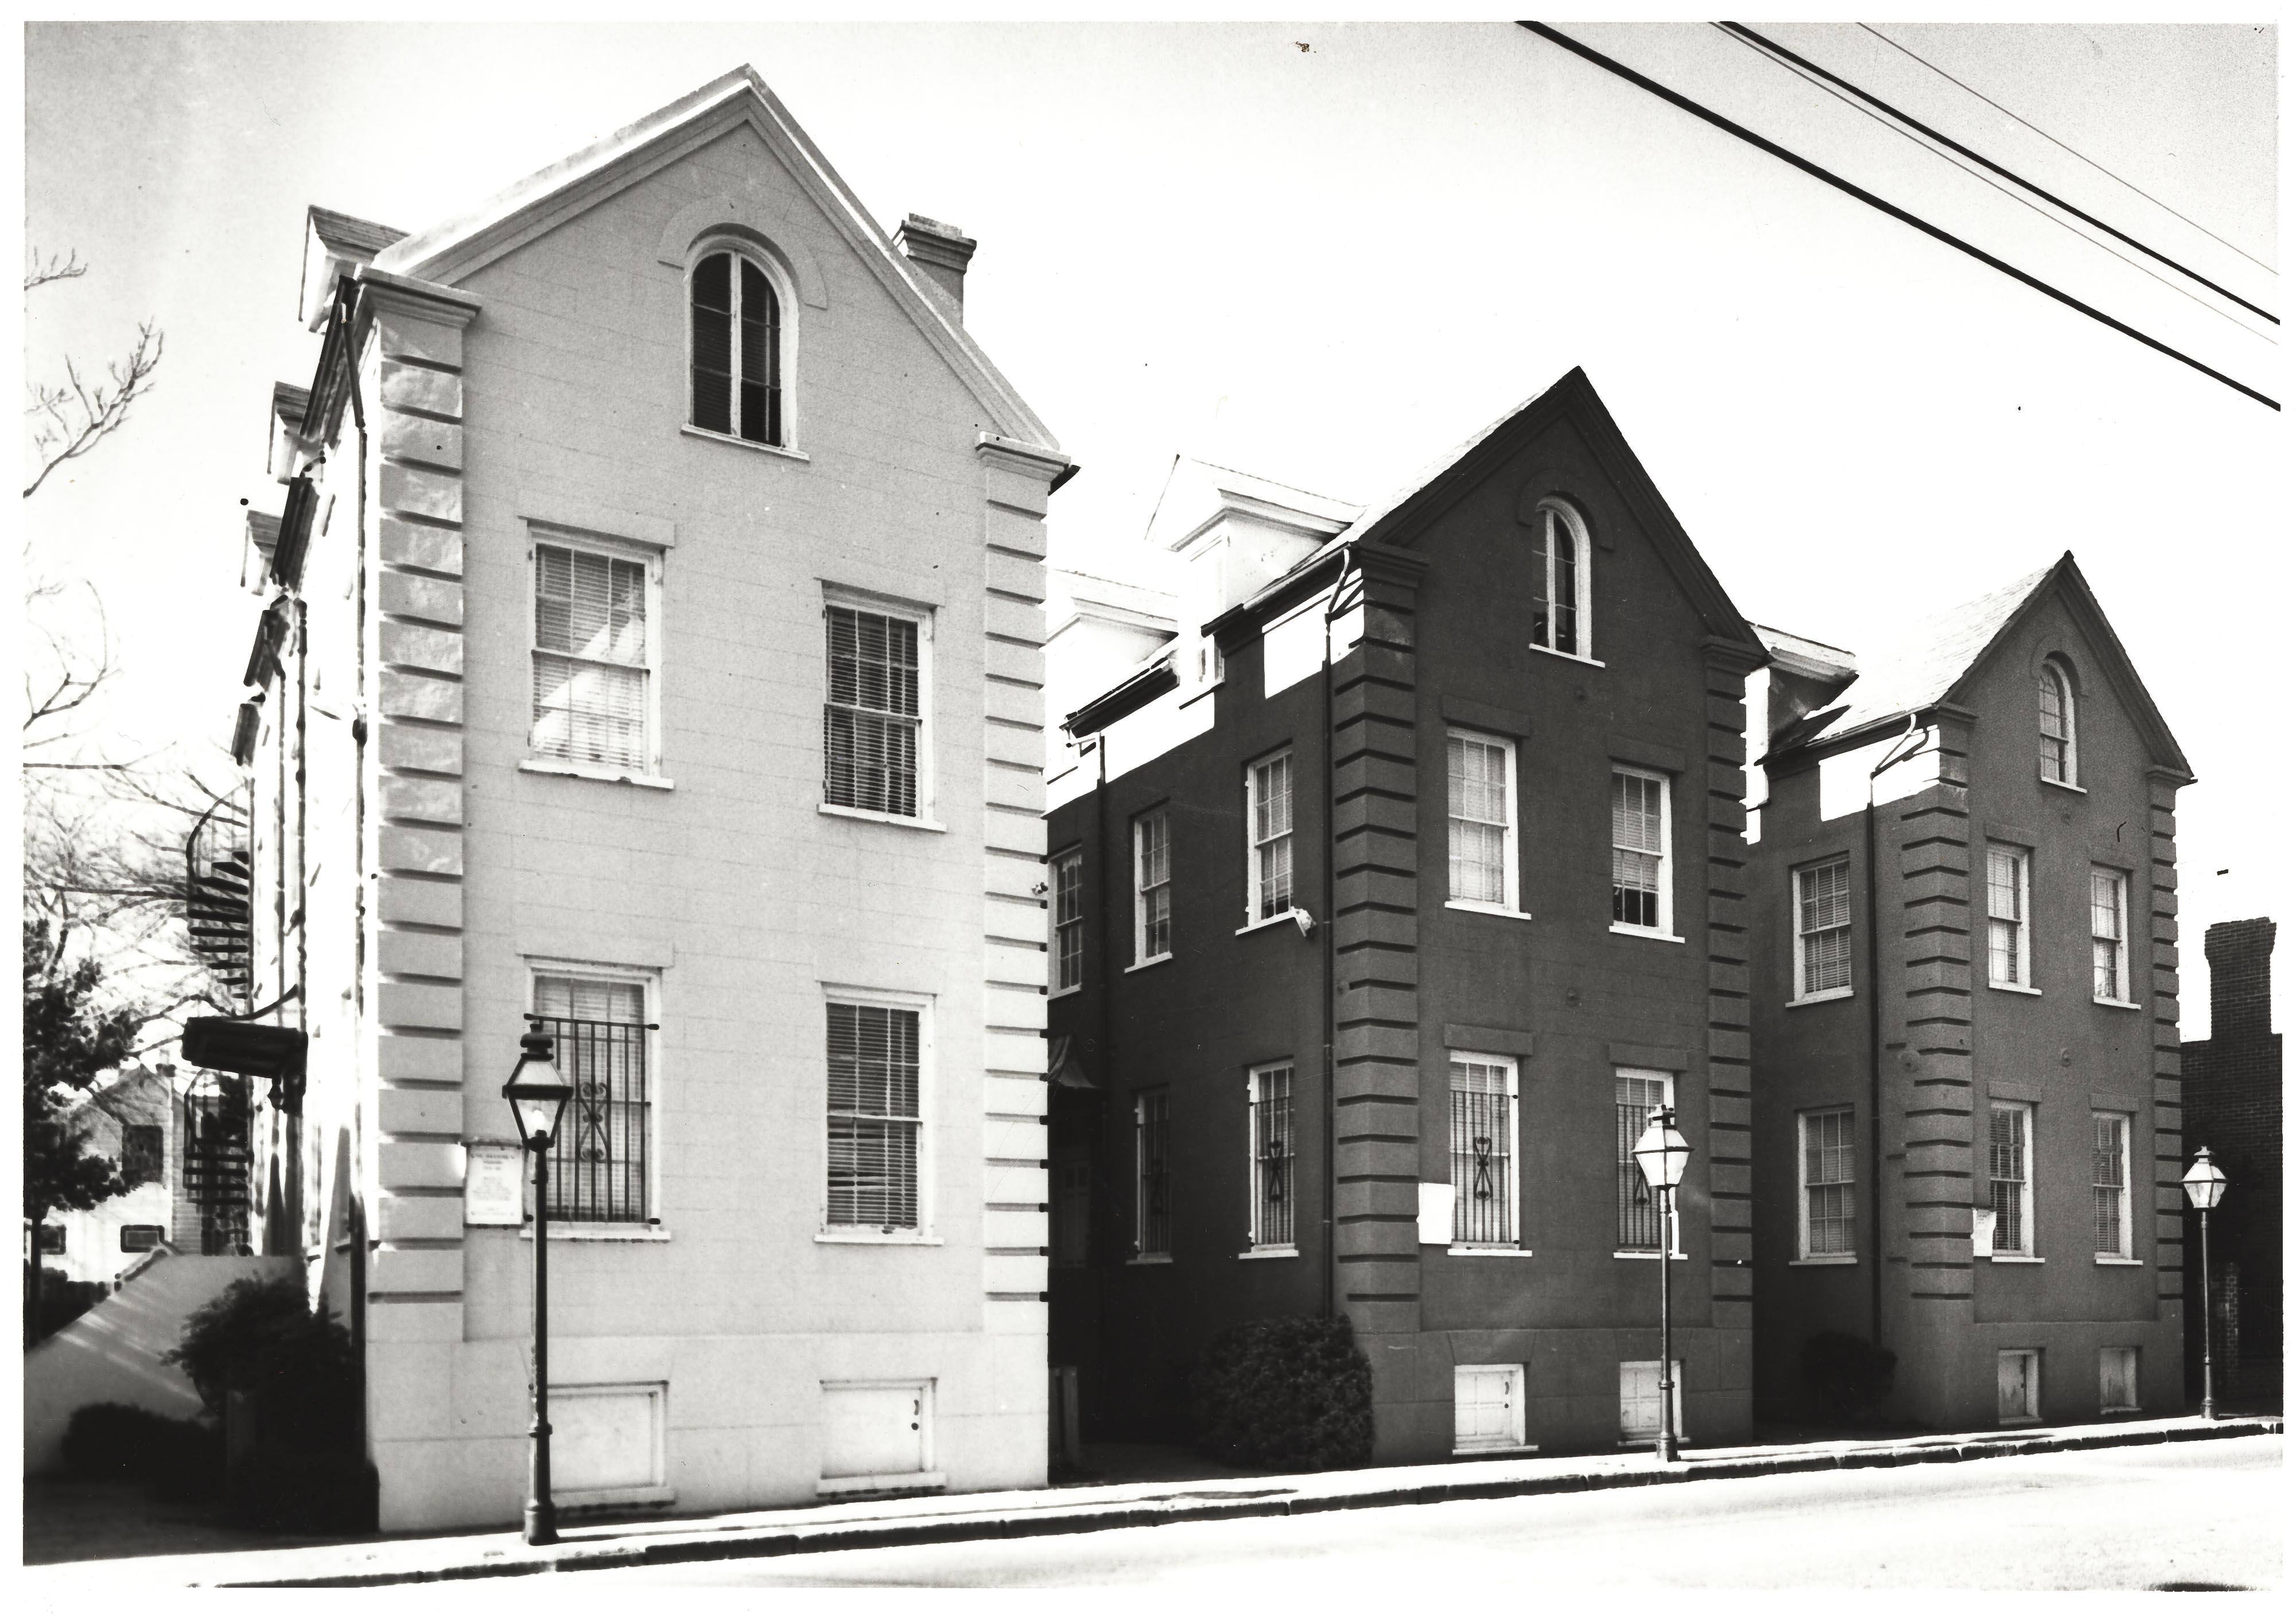 St. Philip Street